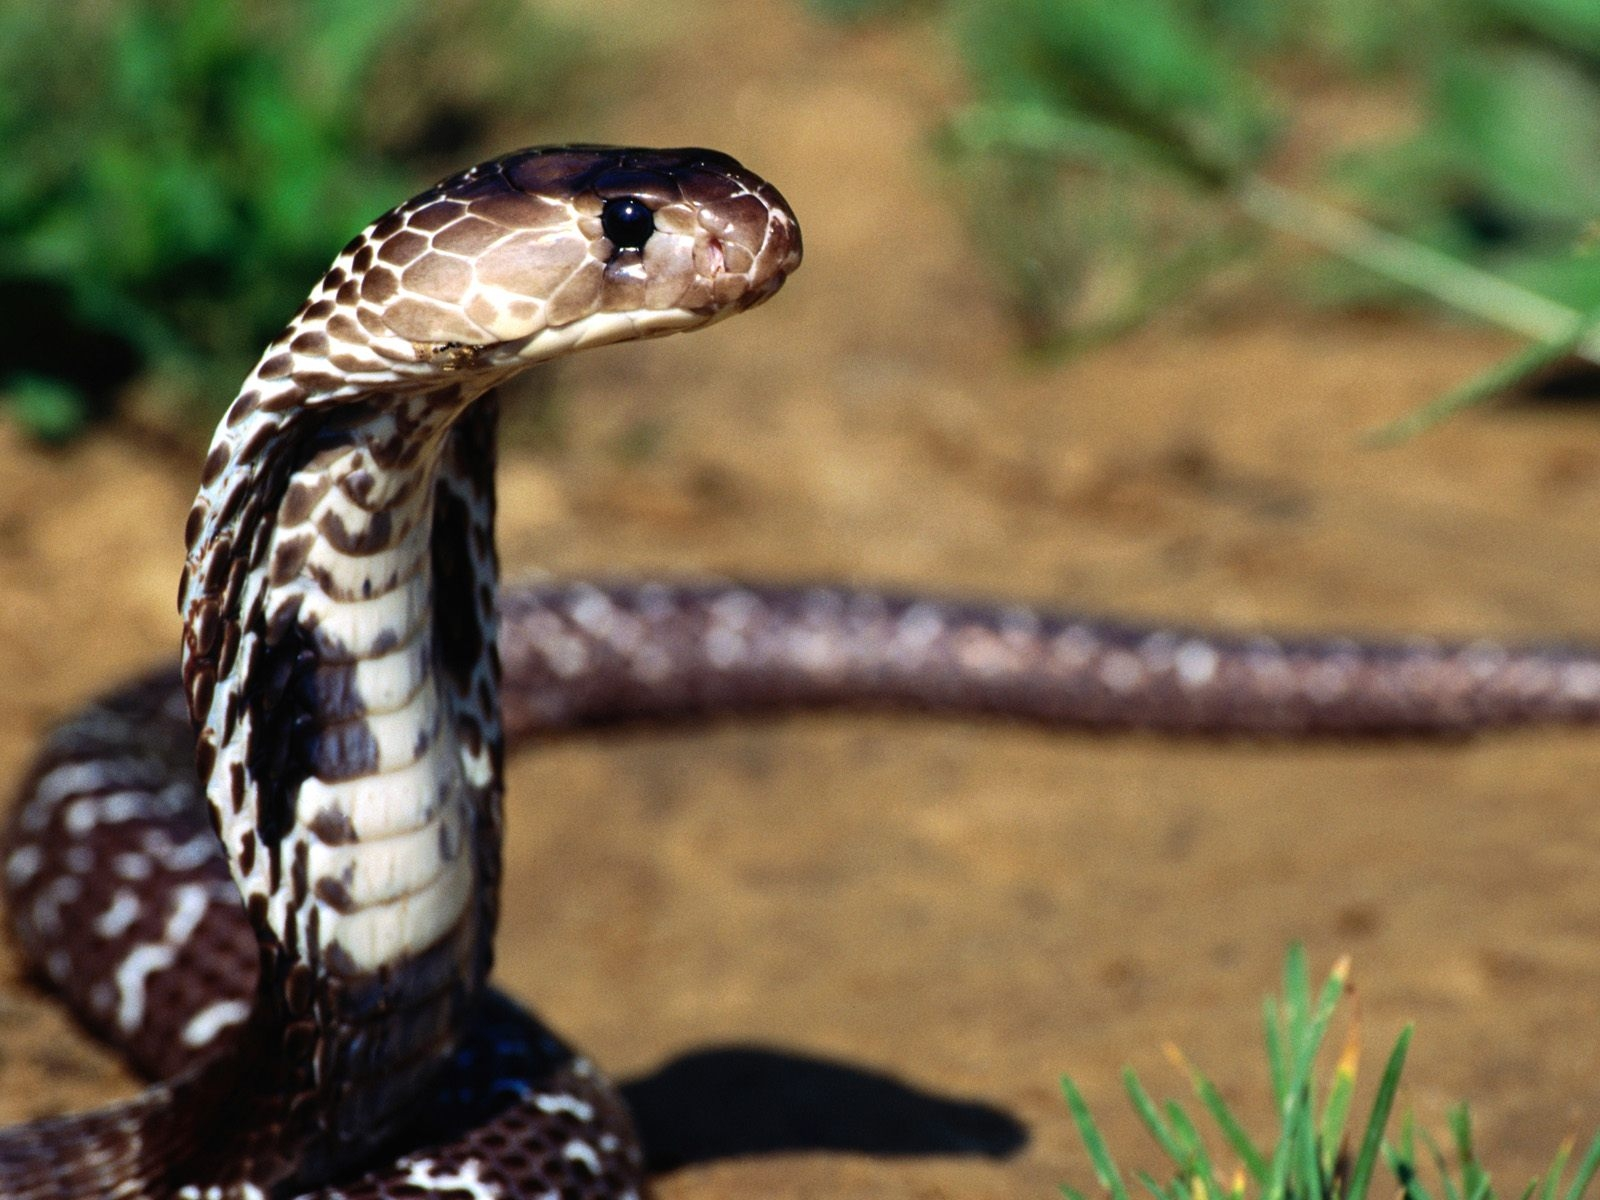 Hd Wallpaper Of Black Snake: Animals Wallpapers: Snakes Wallpaper Hd